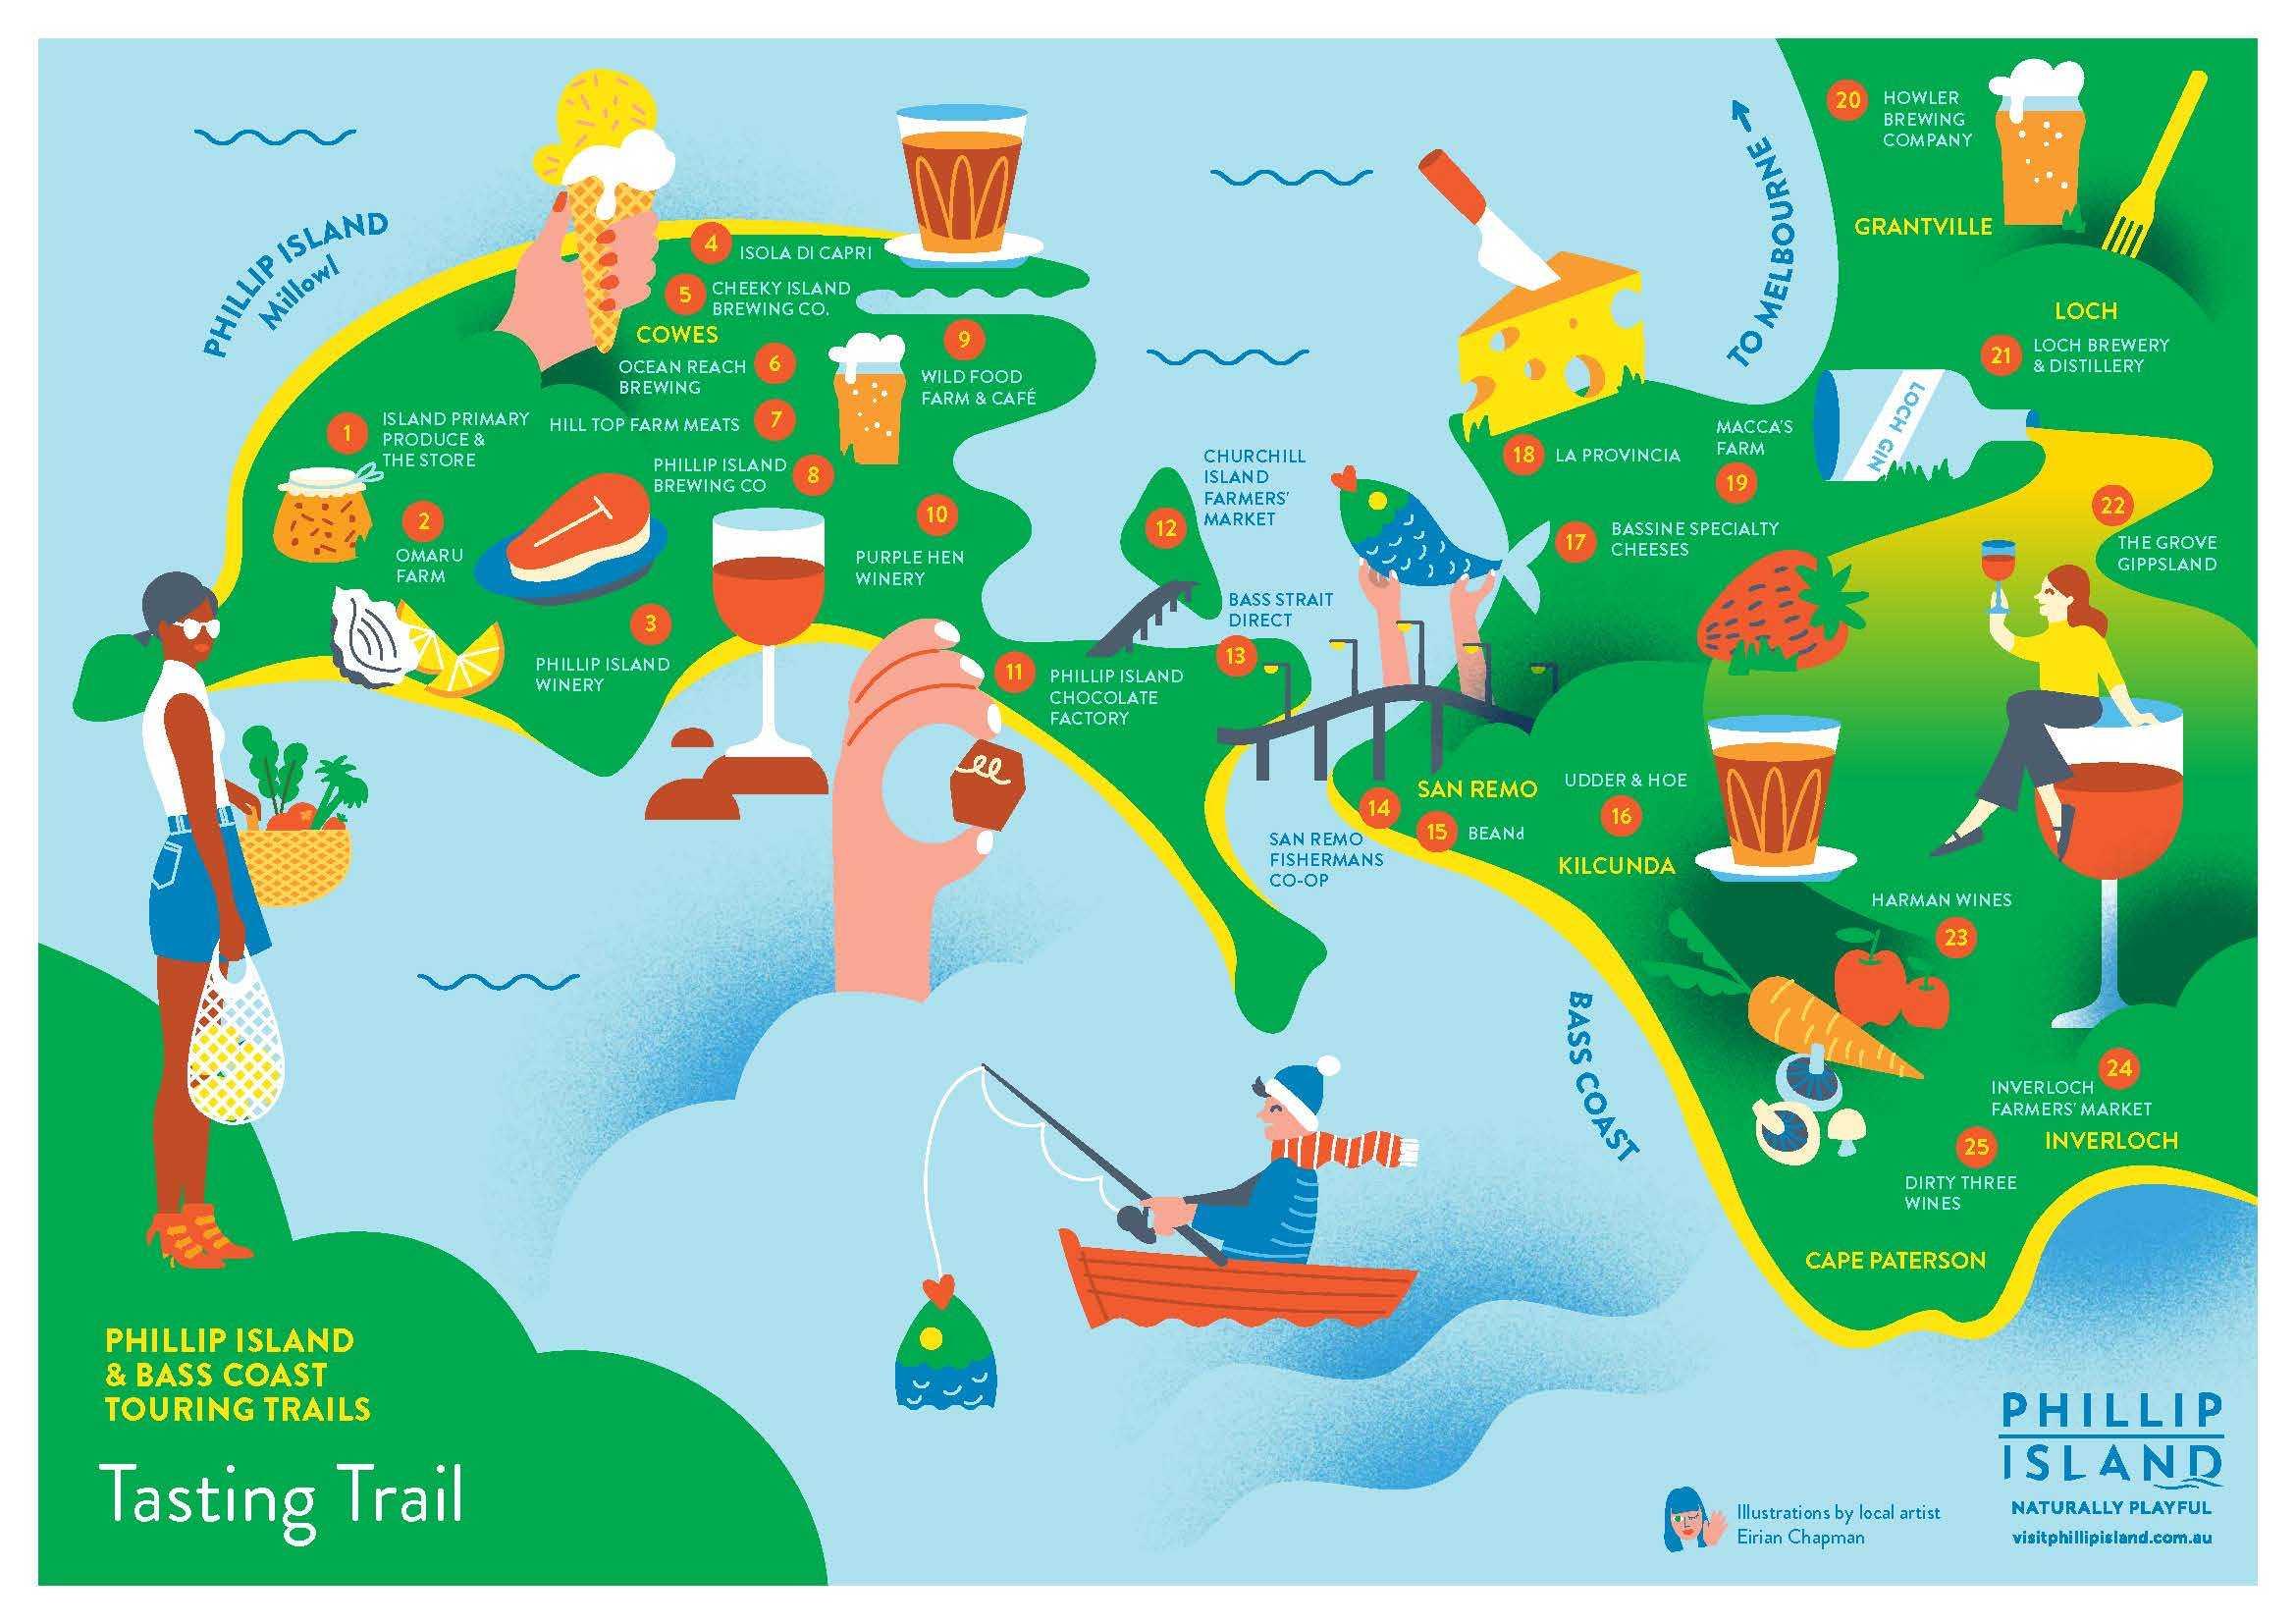 Phillip Island and Bass Coast Tasting Trail